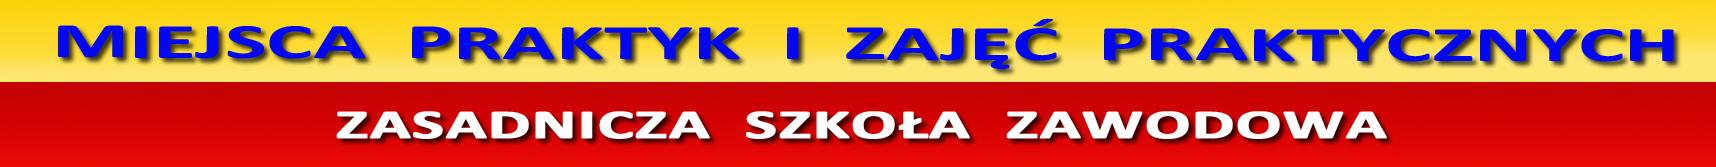 zaj_prakt